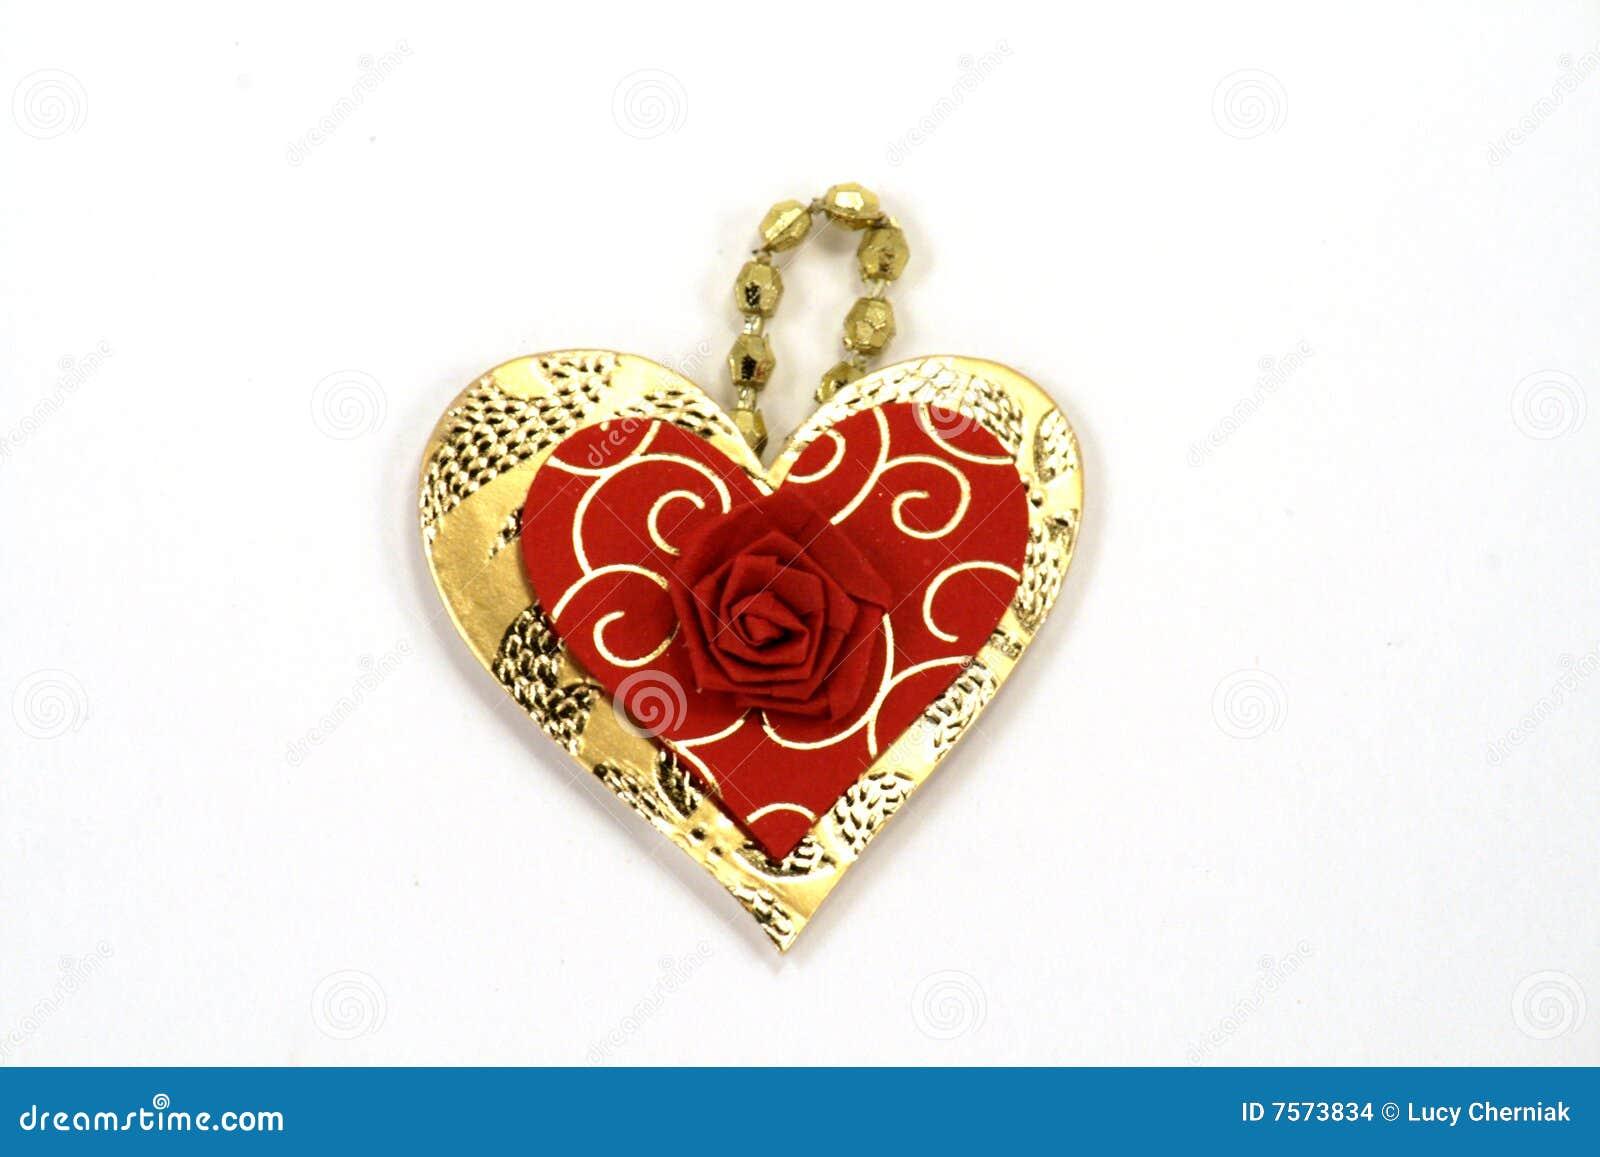 Pendente Heart-shaped